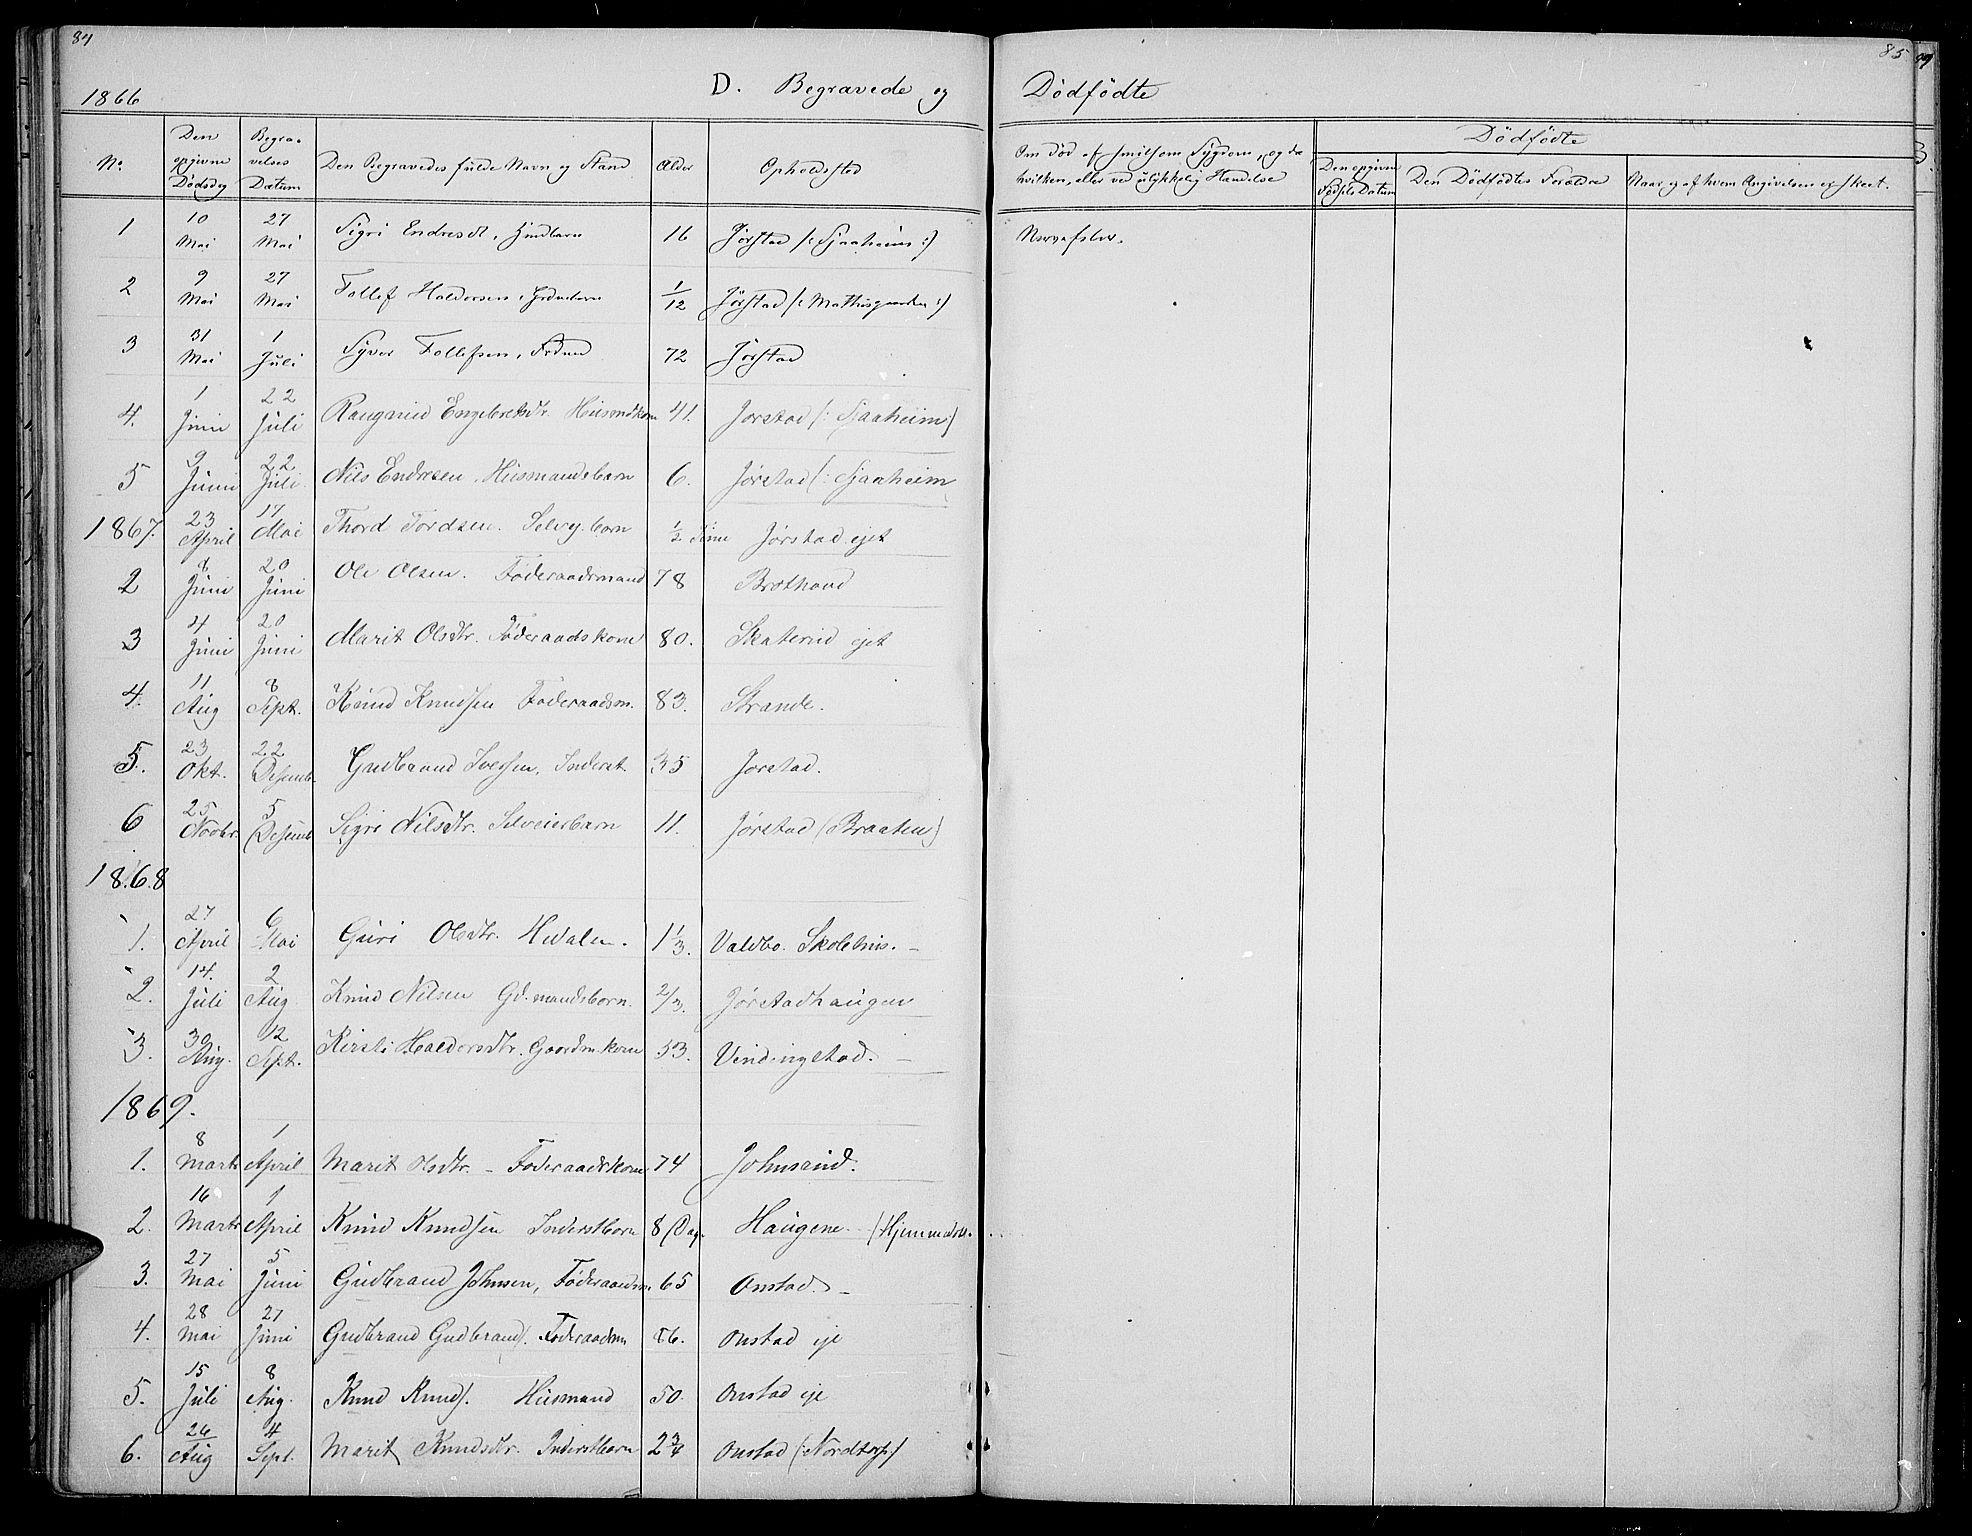 SAH, Øystre Slidre prestekontor, Klokkerbok nr. 2, 1866-1886, s. 84-85